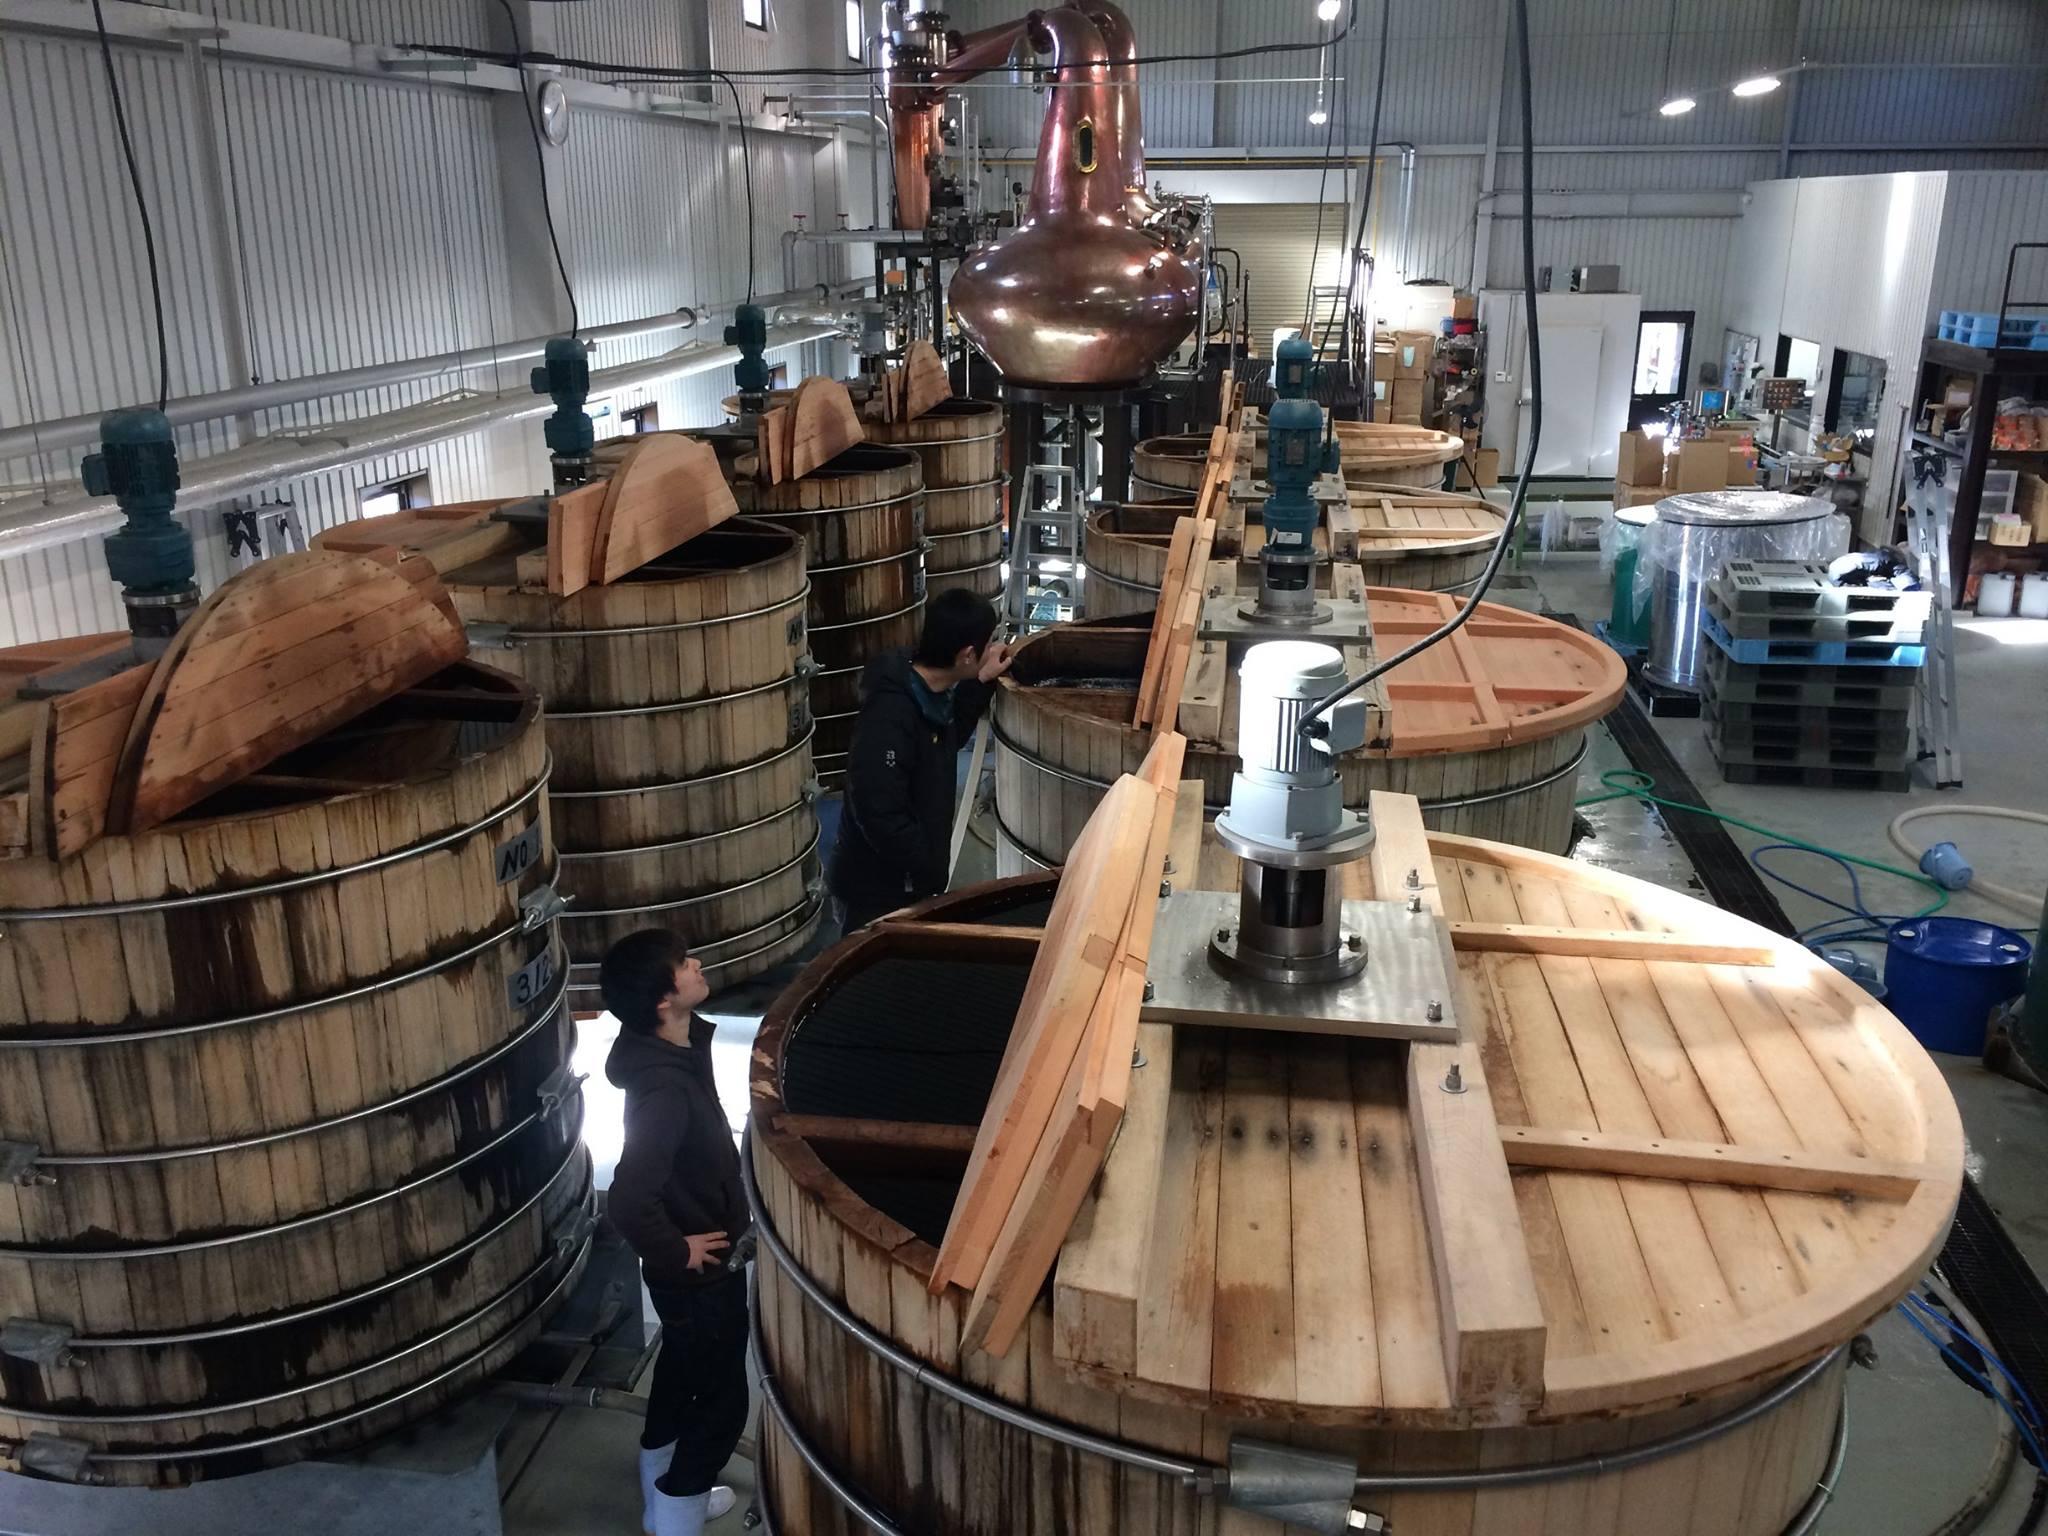 Japanese Whisky Distilleries to Watch 2018-19: Asaka Distillery, Chichibu Distillery, Nukada Distillery